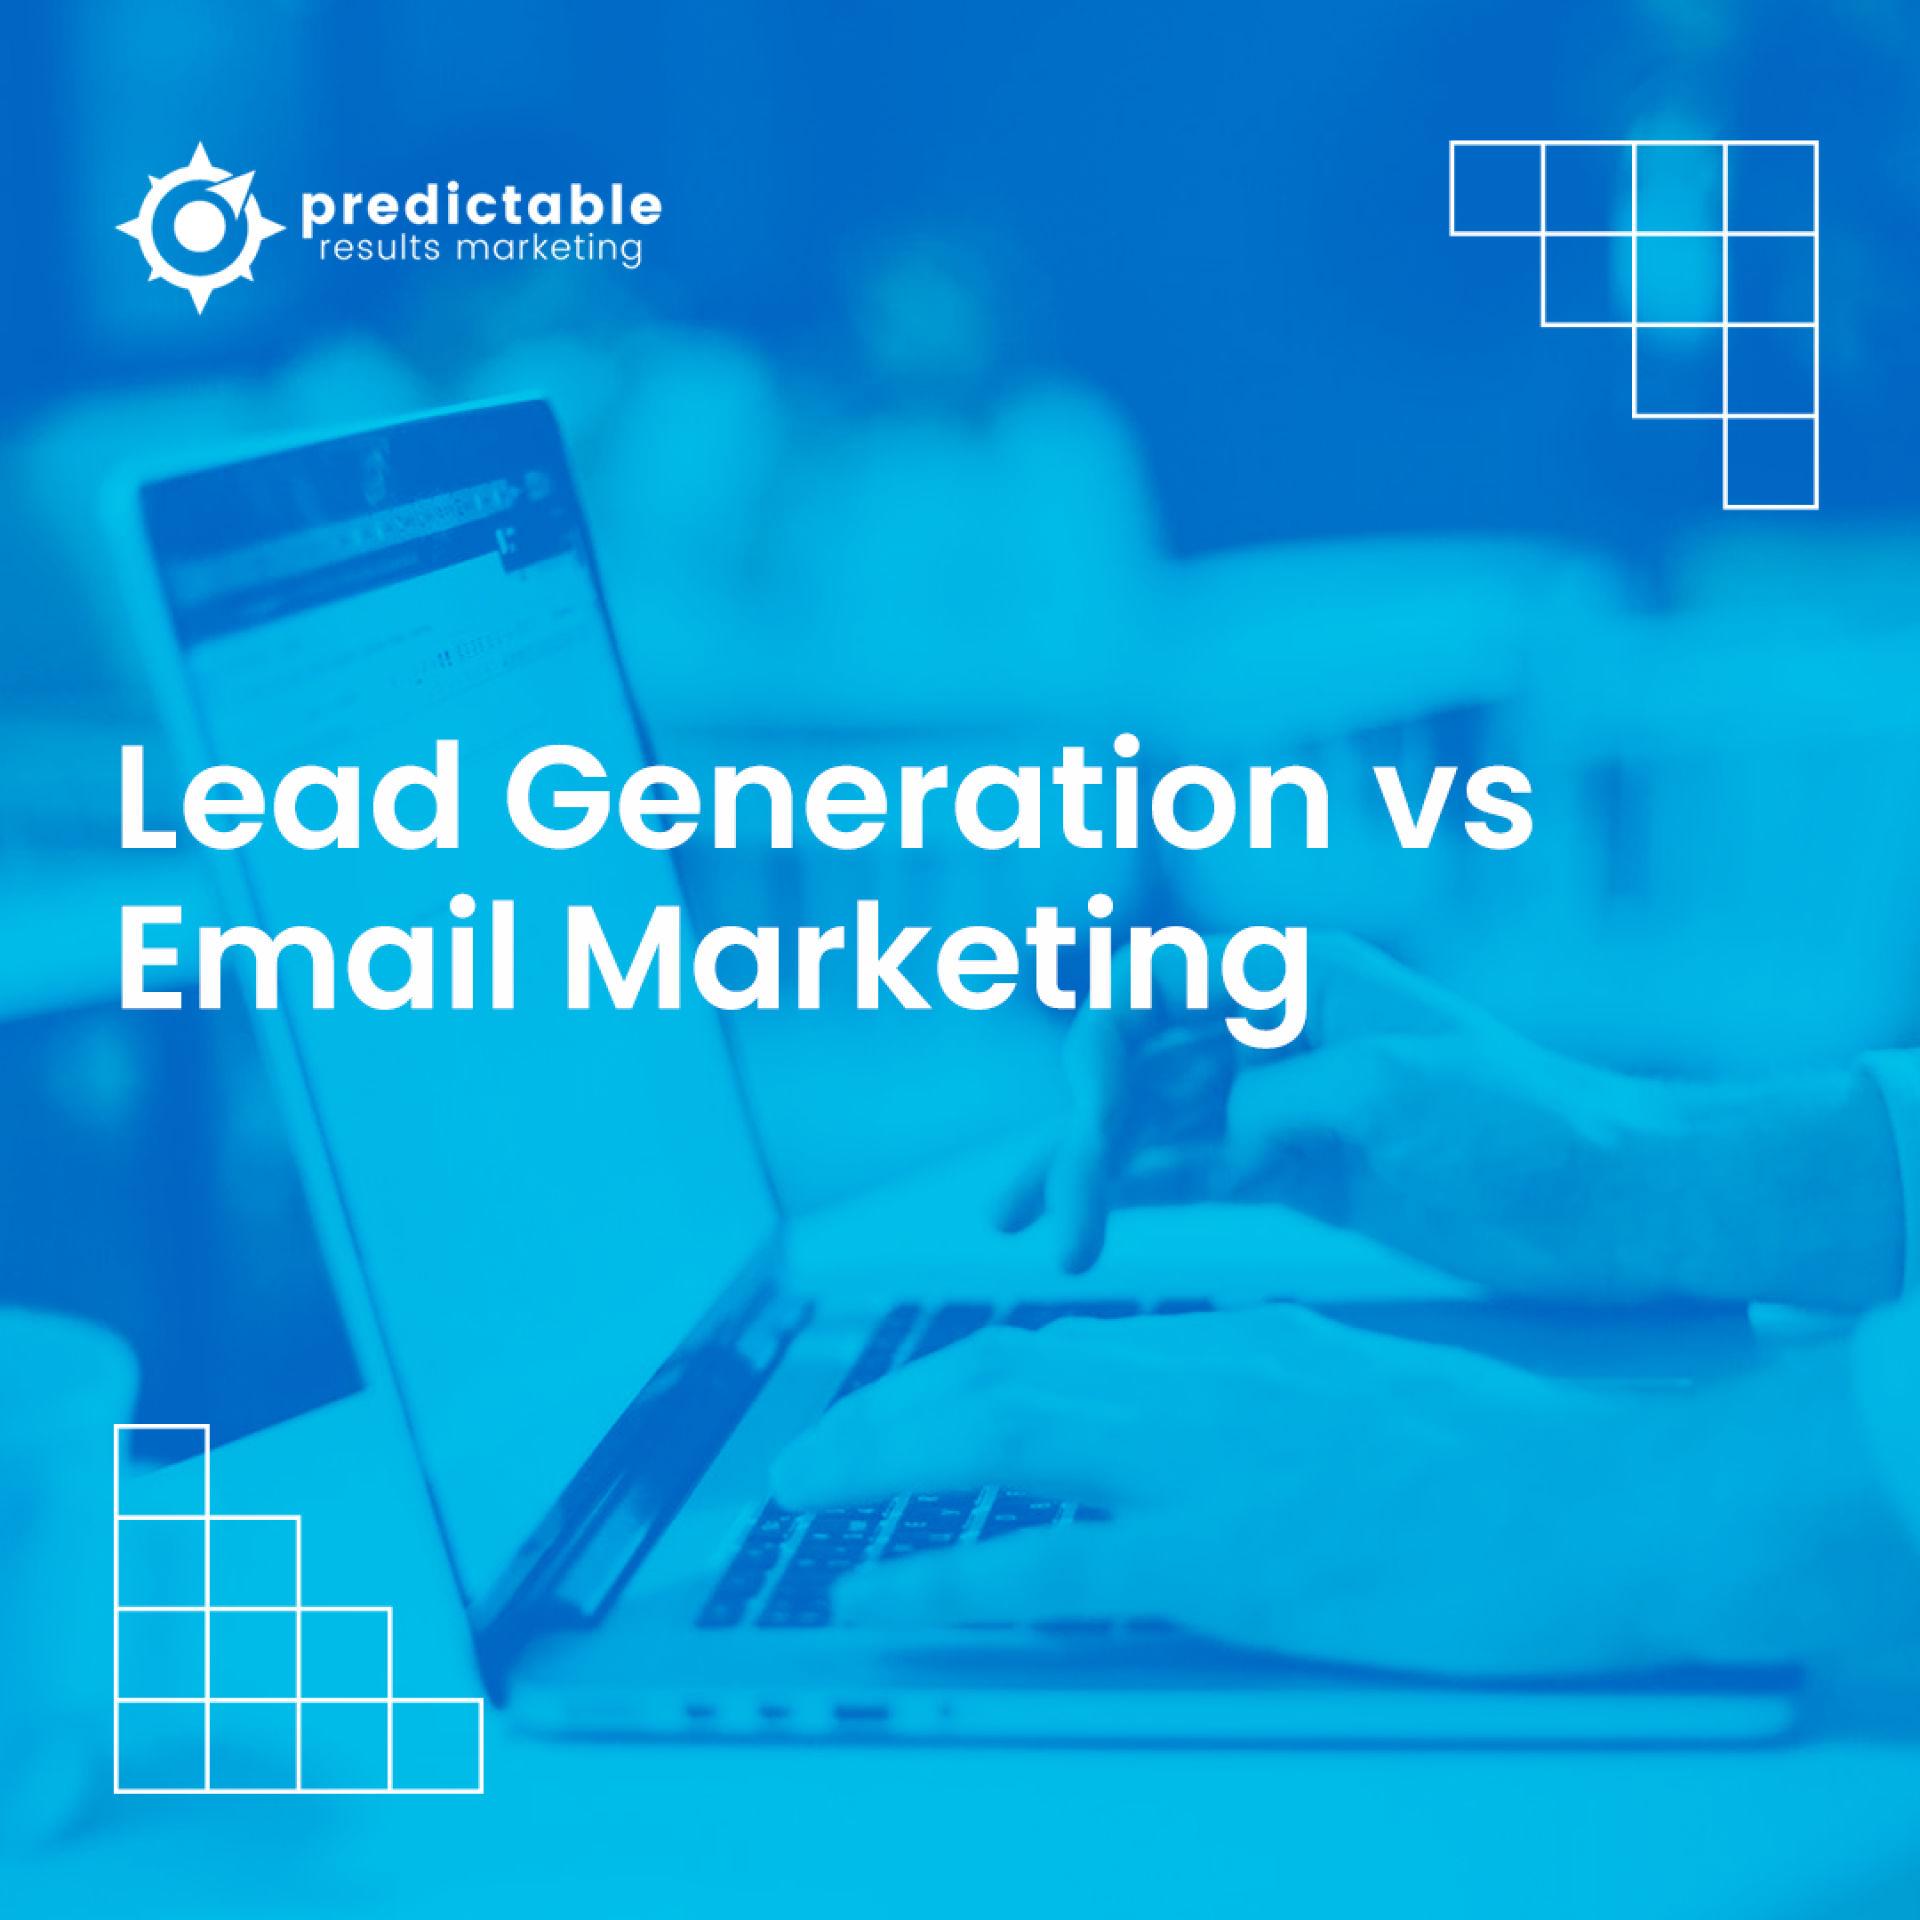 Lead Generation vs Email Marketing